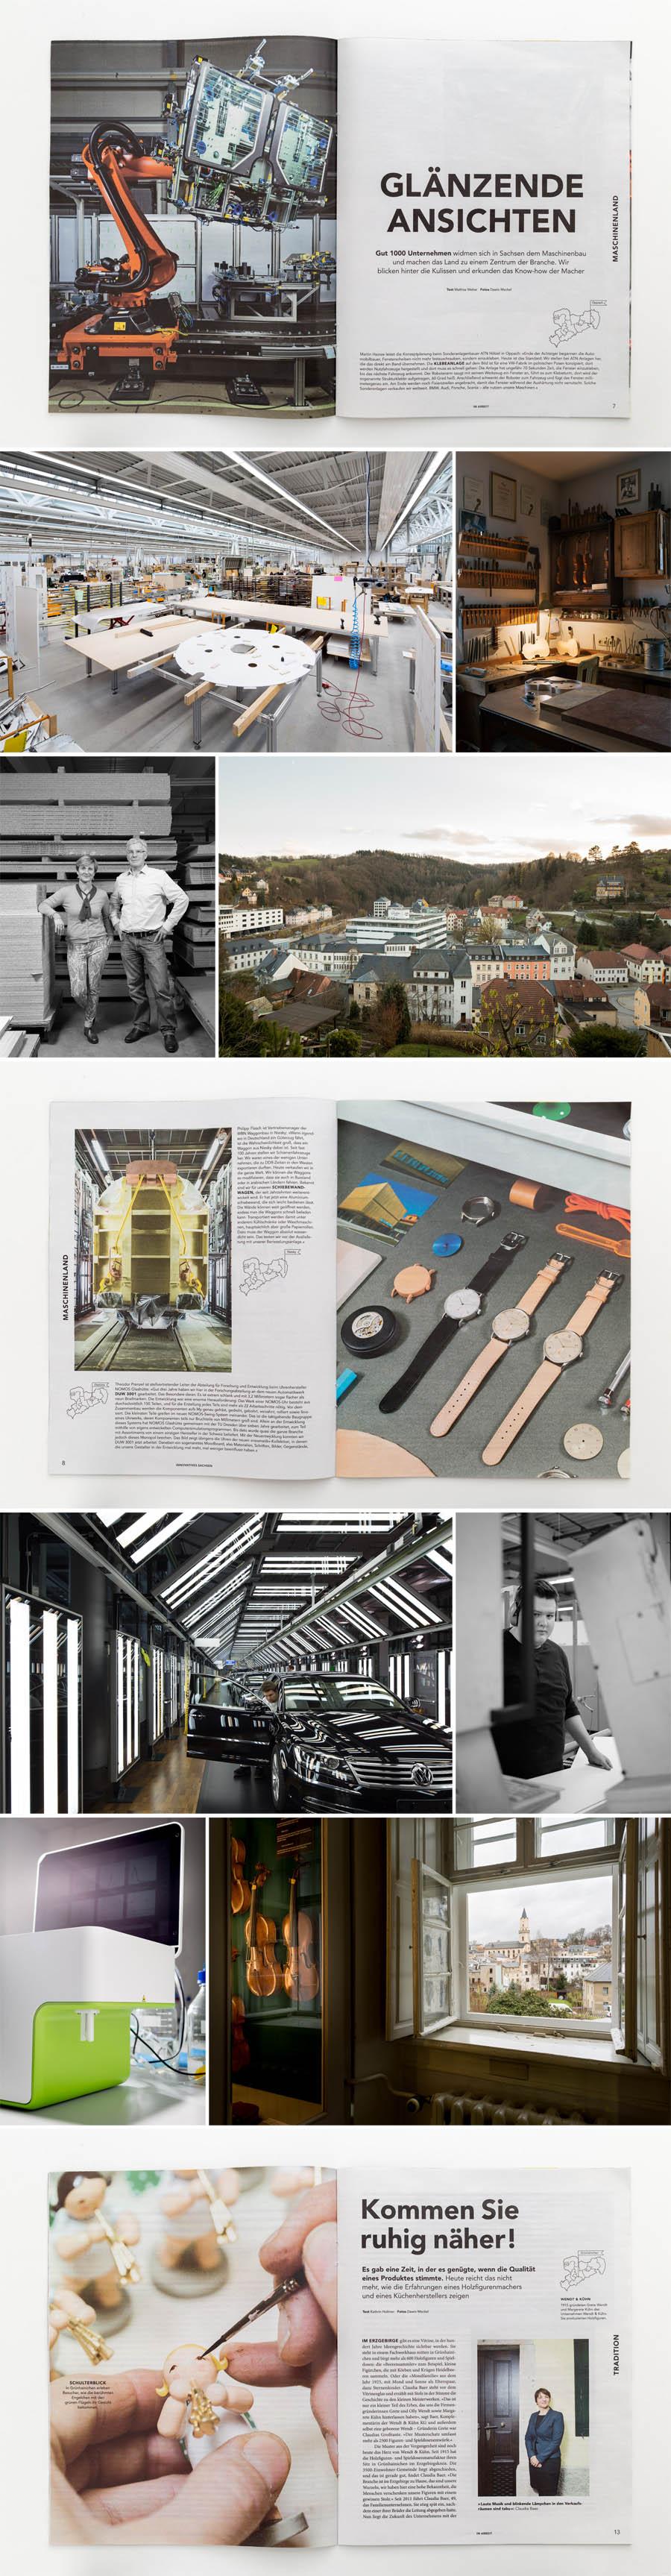 Innovaties Sachsen_001